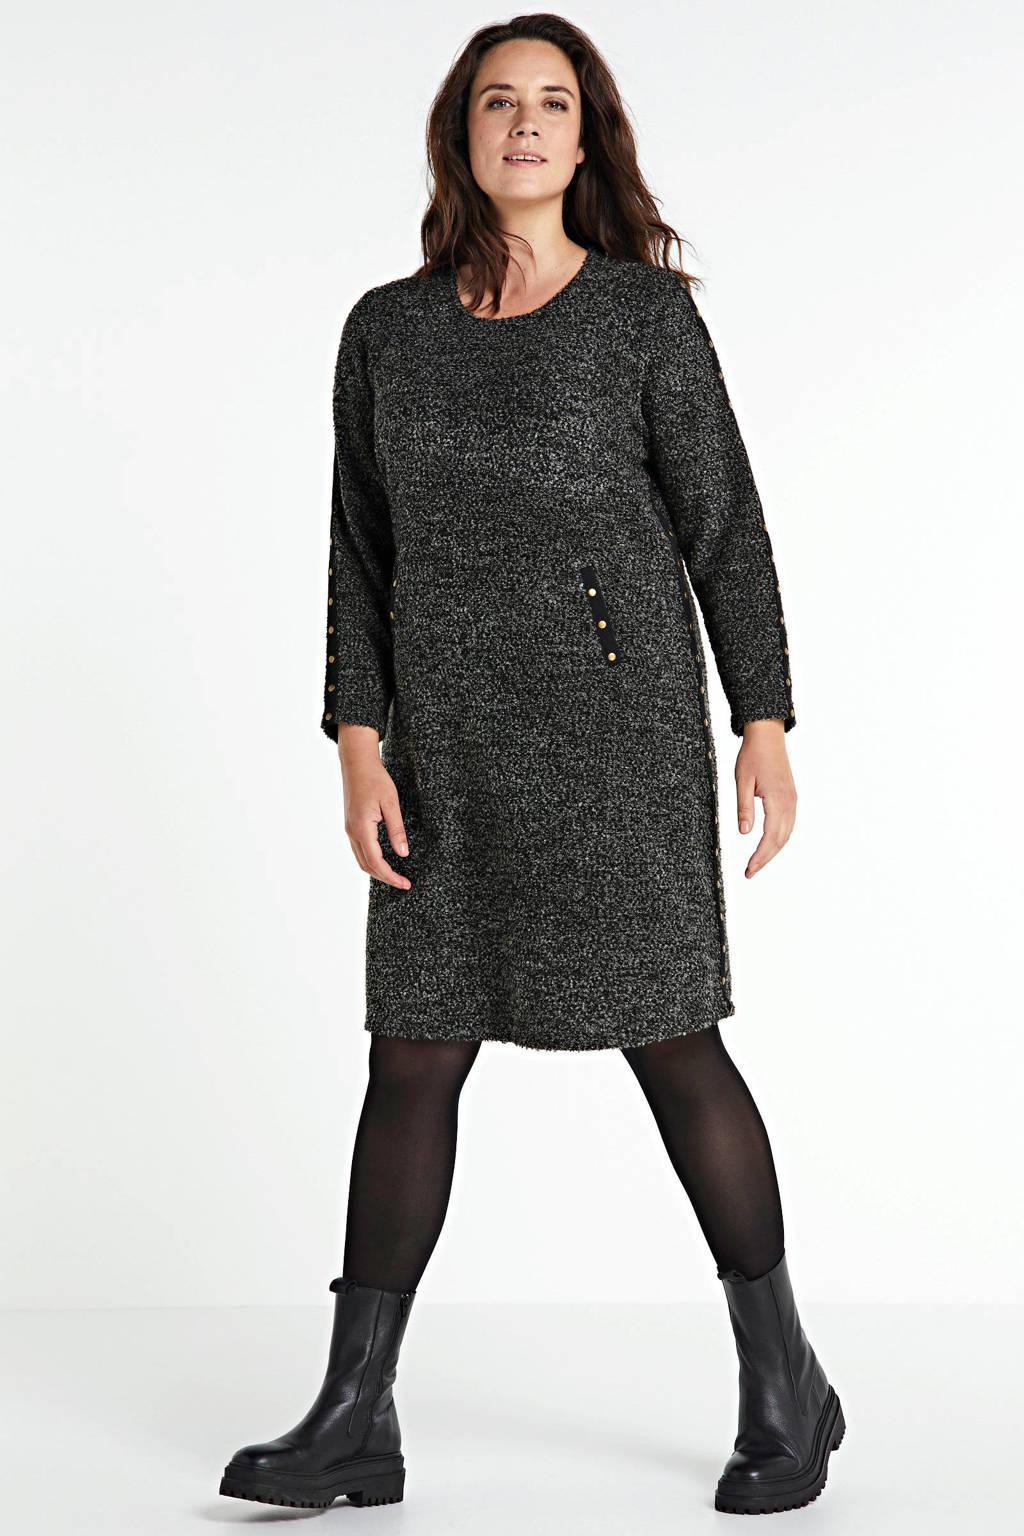 No Secret A-lijn jurk antraciet/zwart, Antraciet/zwart